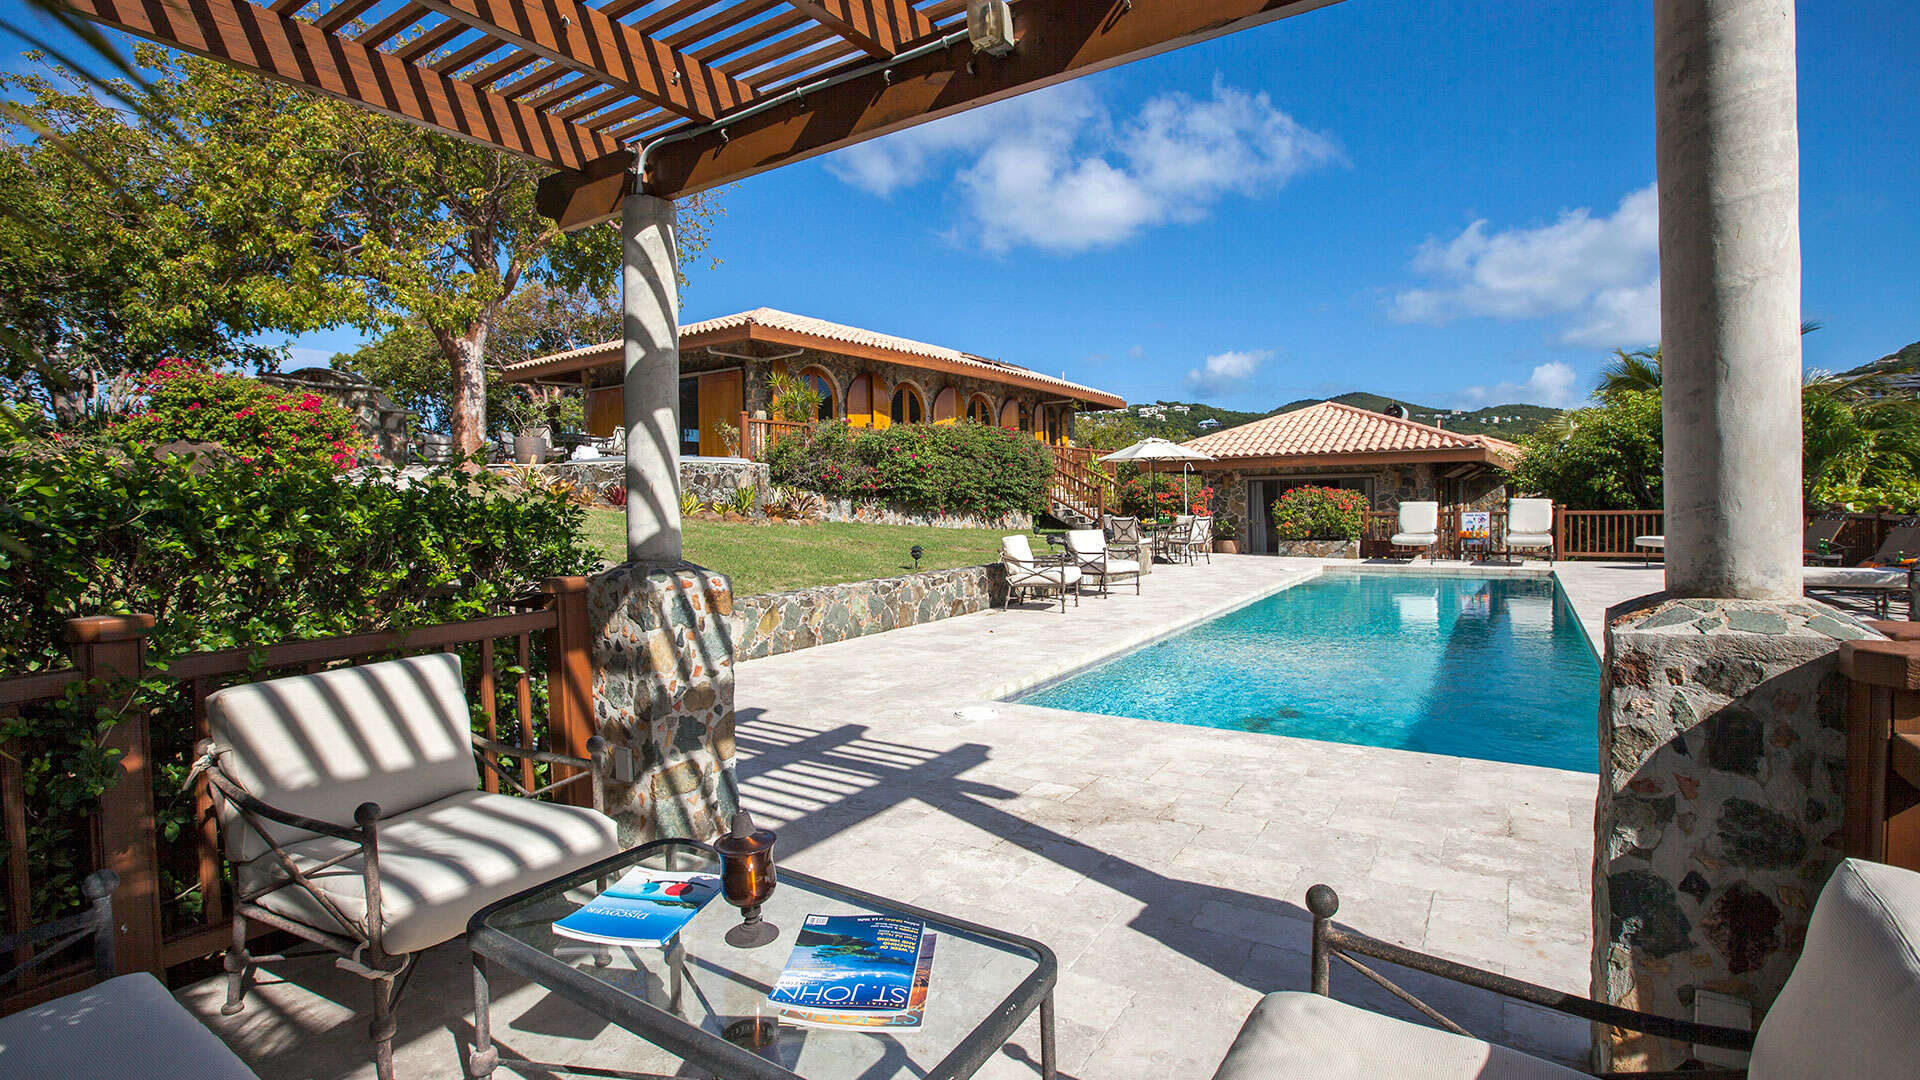 Luxury villa rentals caribbean - Usvi - St john - Great cruzbay - Estate Rose - Image 1/25